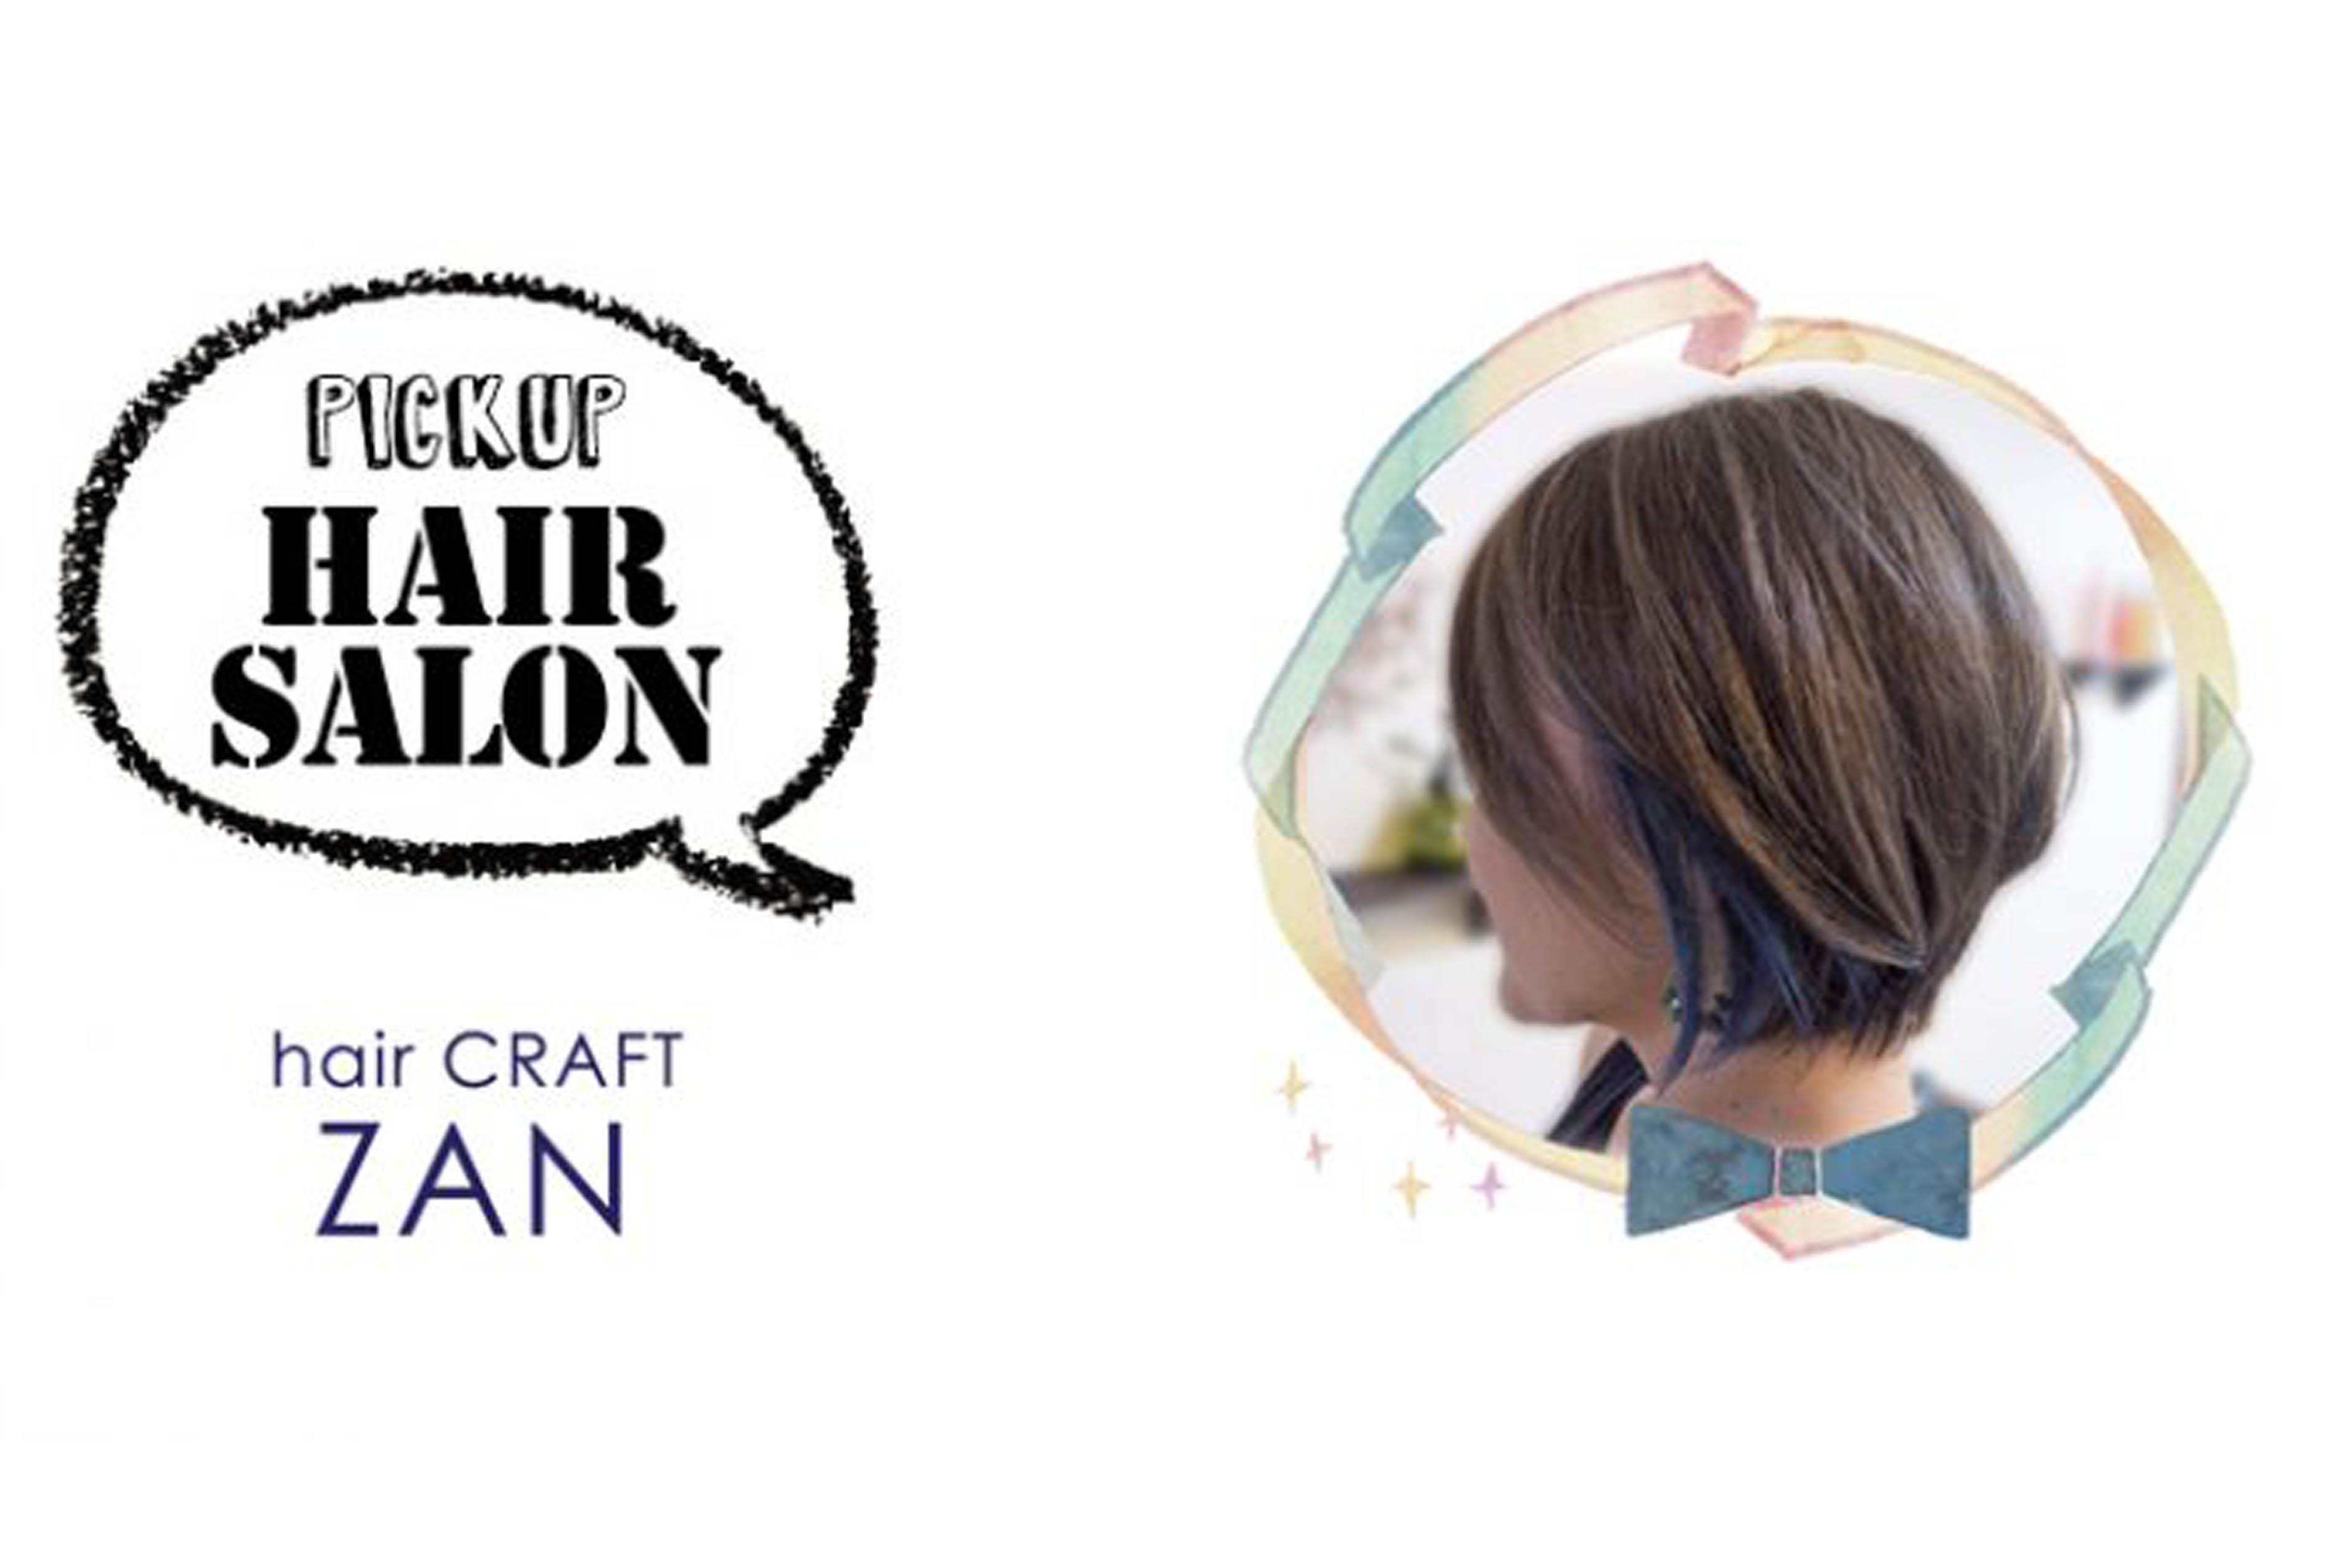 【PICK UP HAIR SALON】 hair CRAFT ZAN - ワイズデジタル【タイで生活する人のための情報サイト】